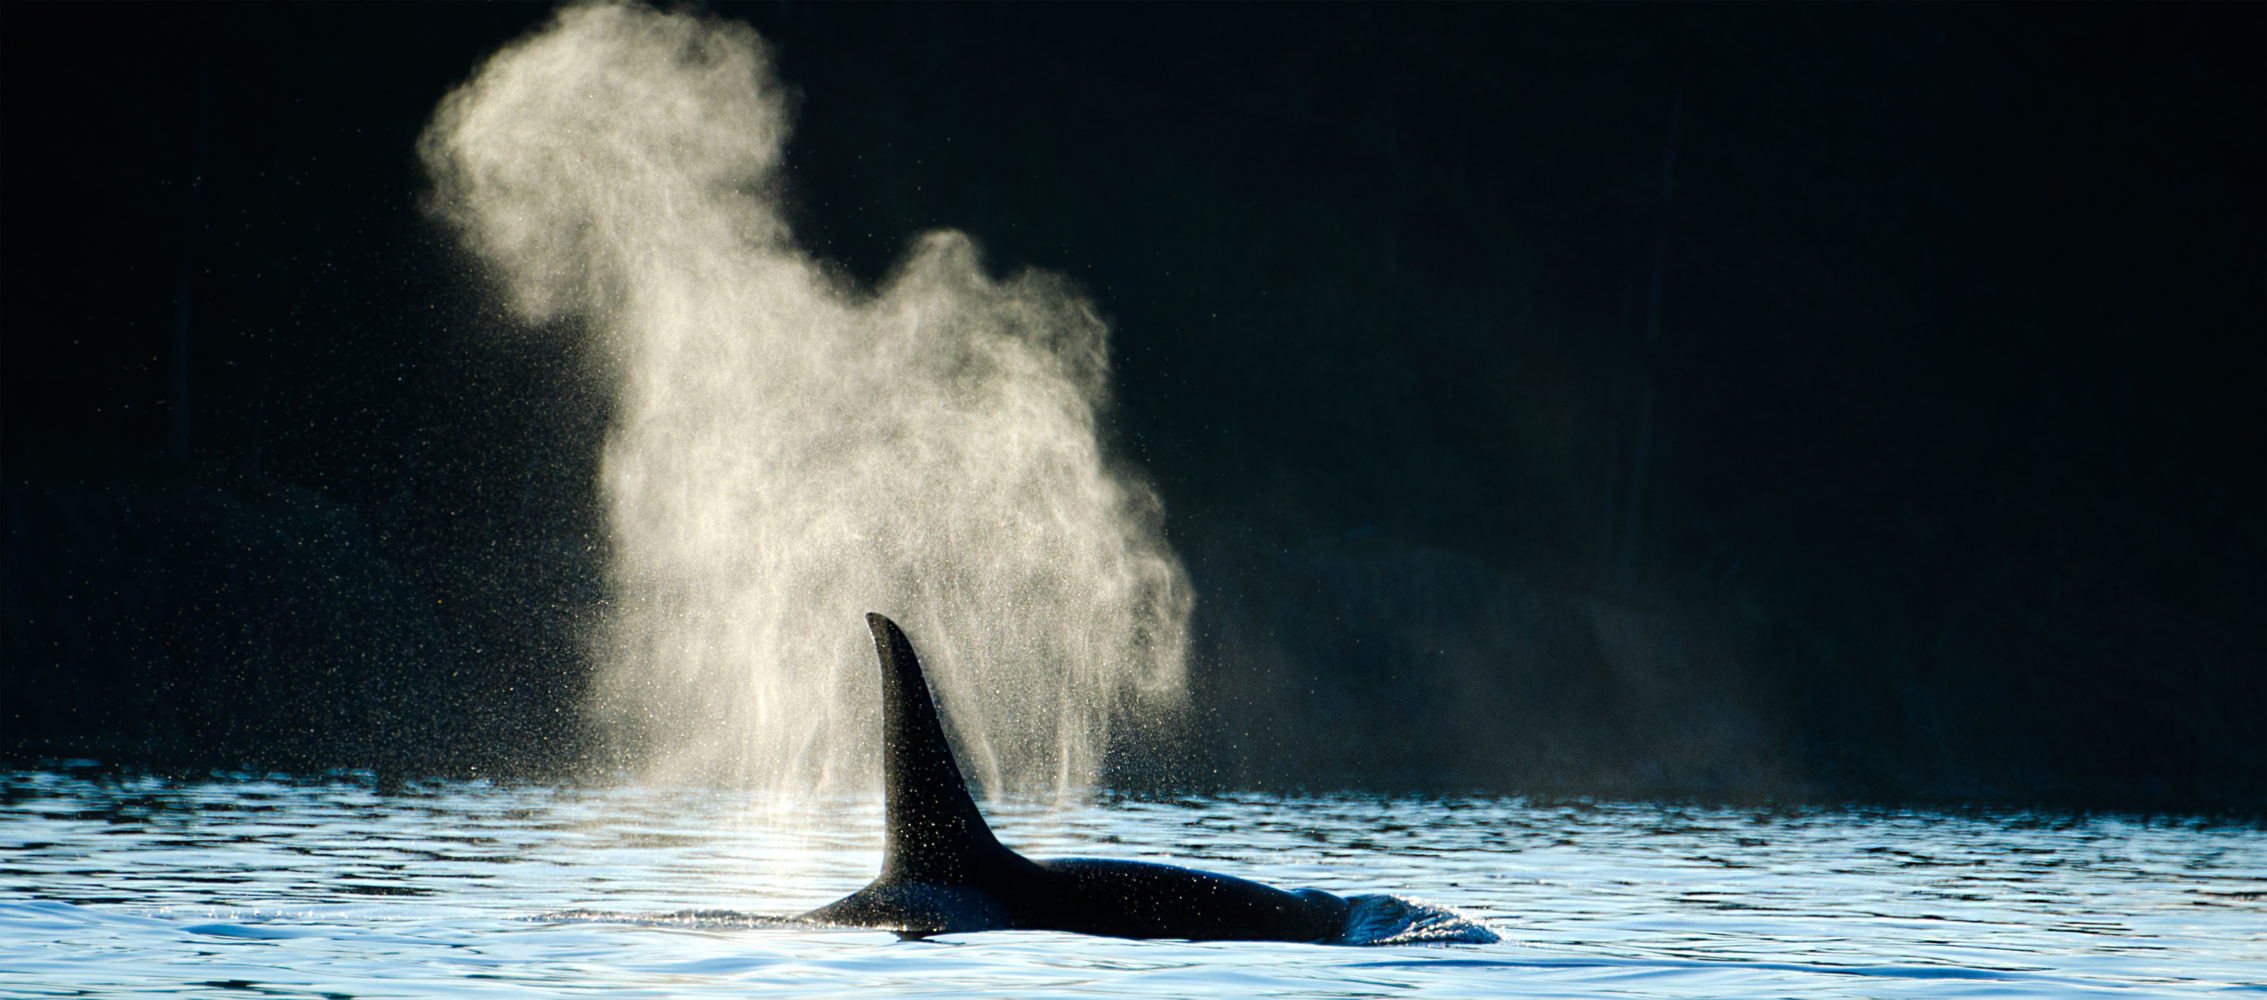 Wal Kanada Victoria Orca Killer Whale Blowing ©123RF